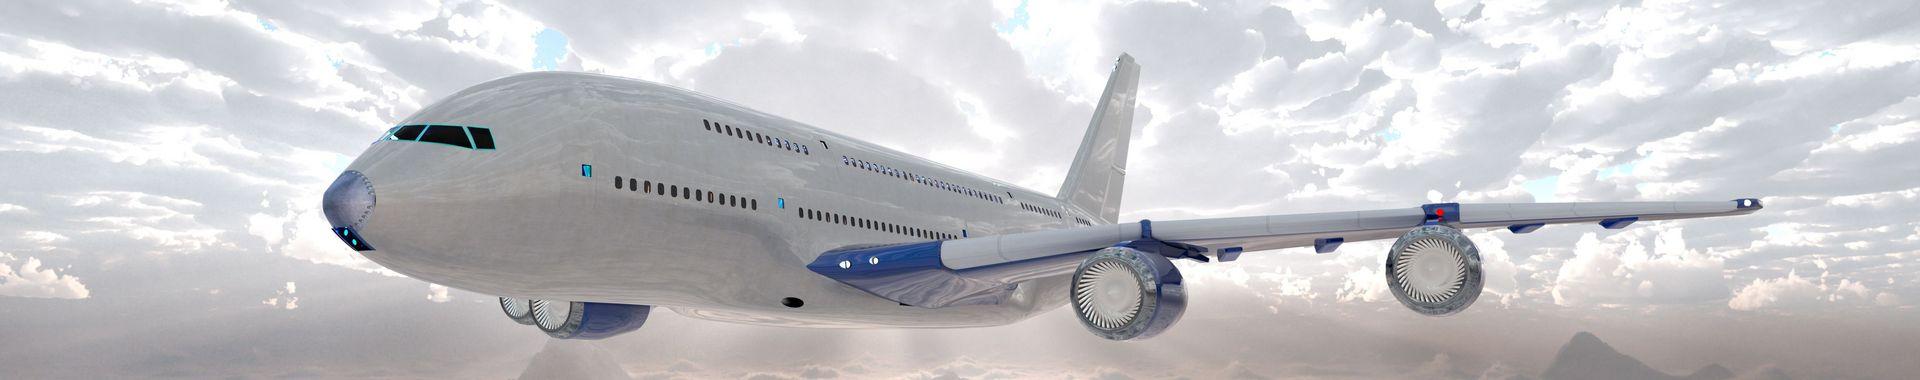 [Translate to Japanisch:] vibration airplane